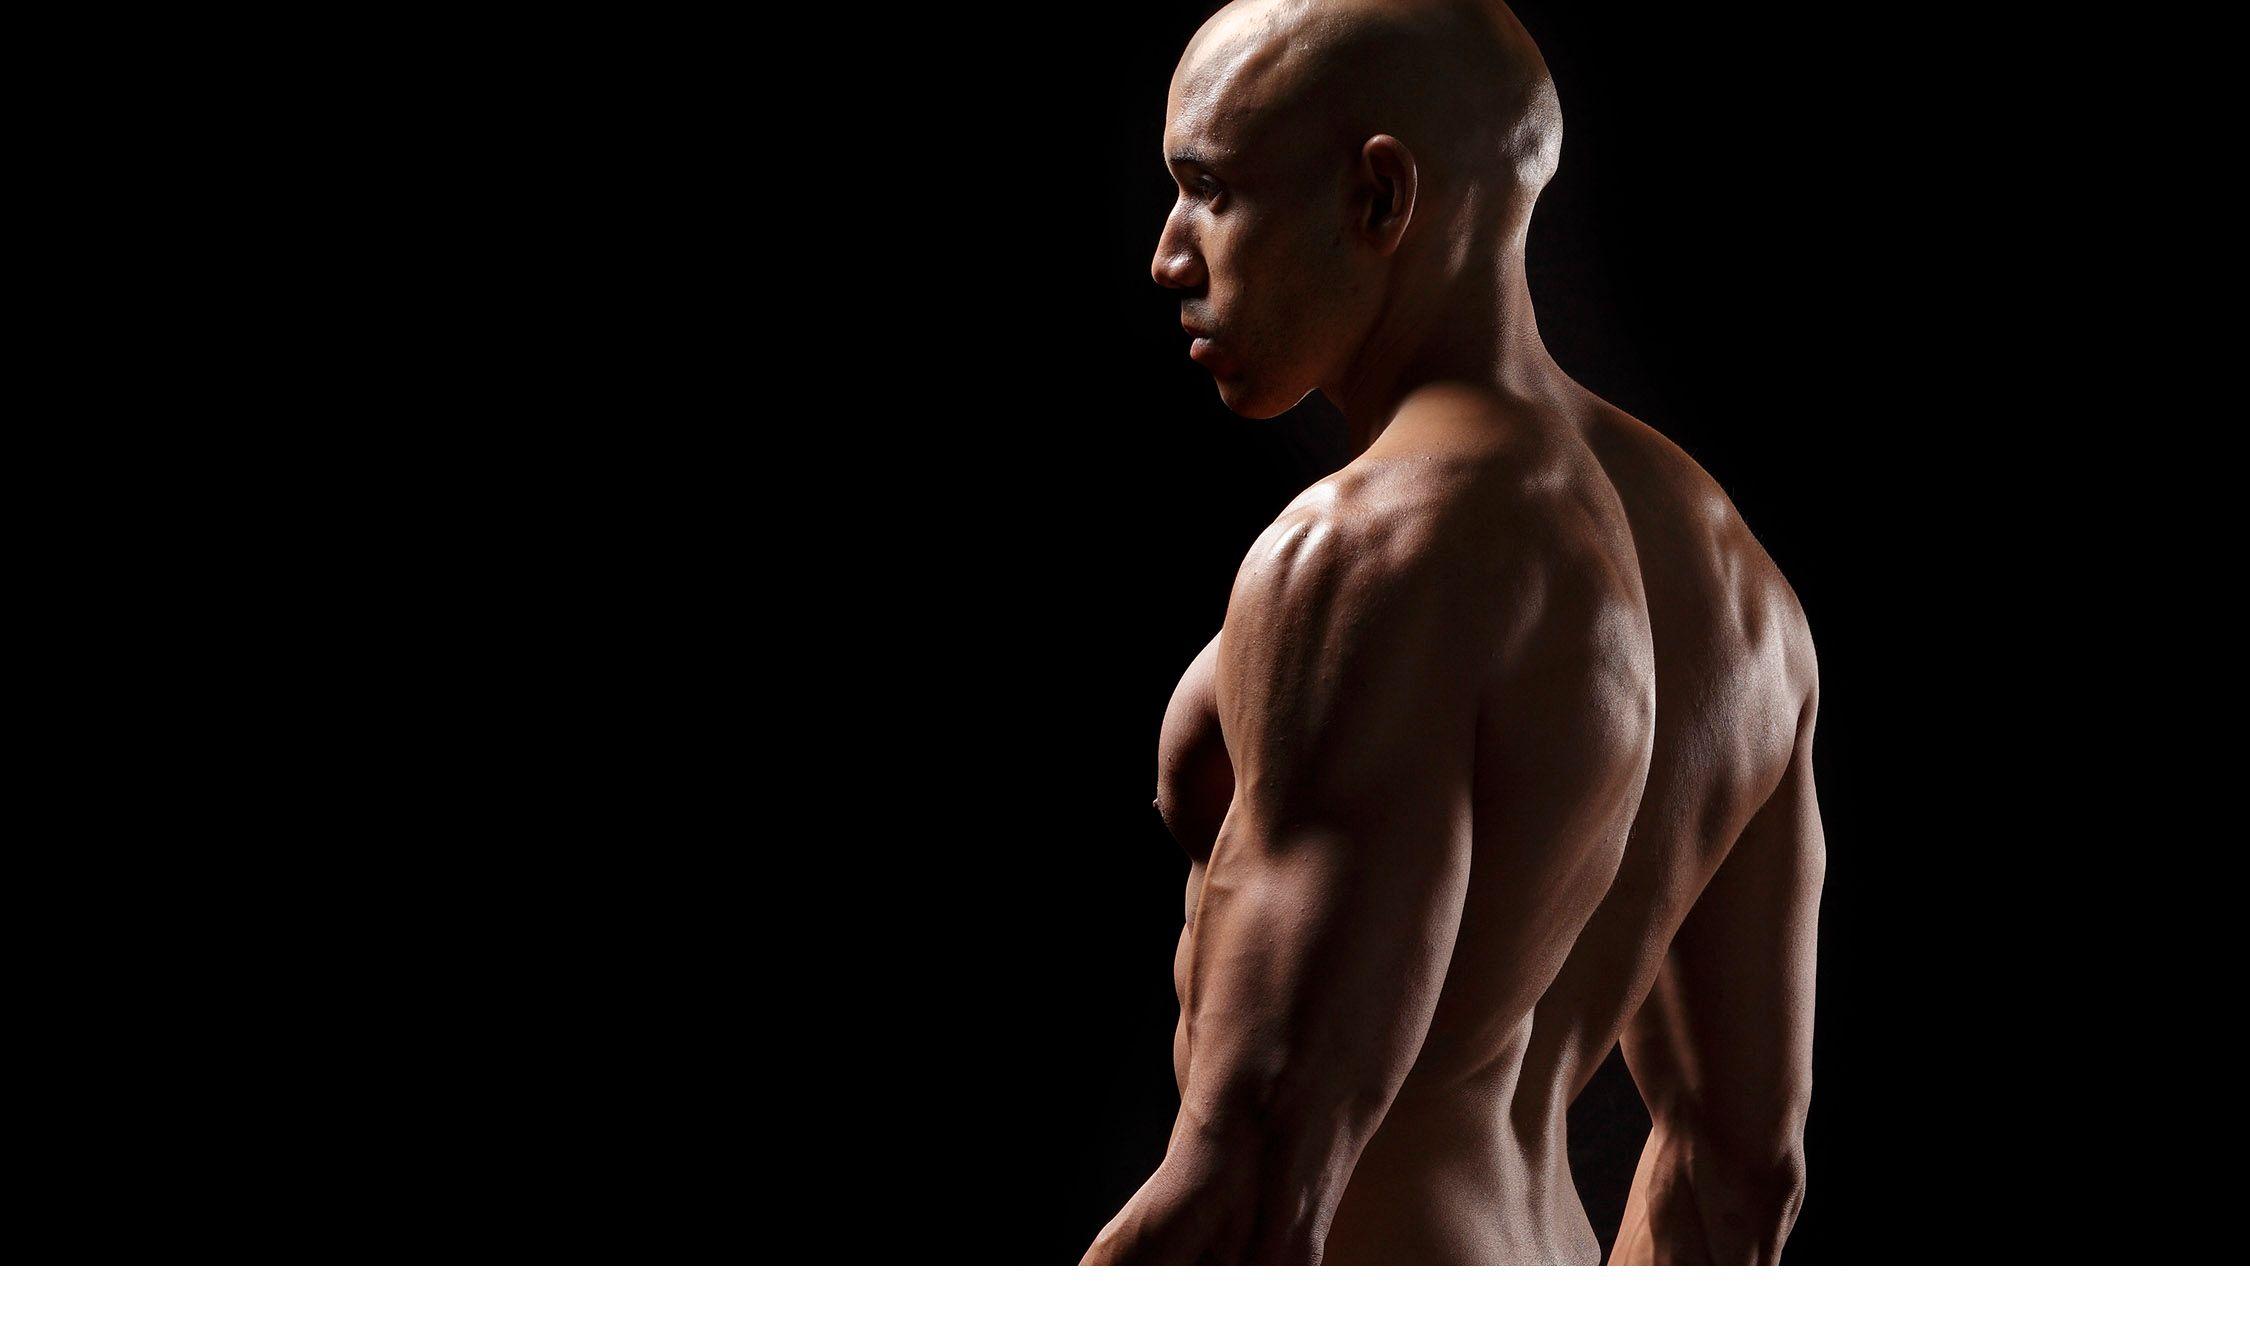 San Diego fitness phoographer